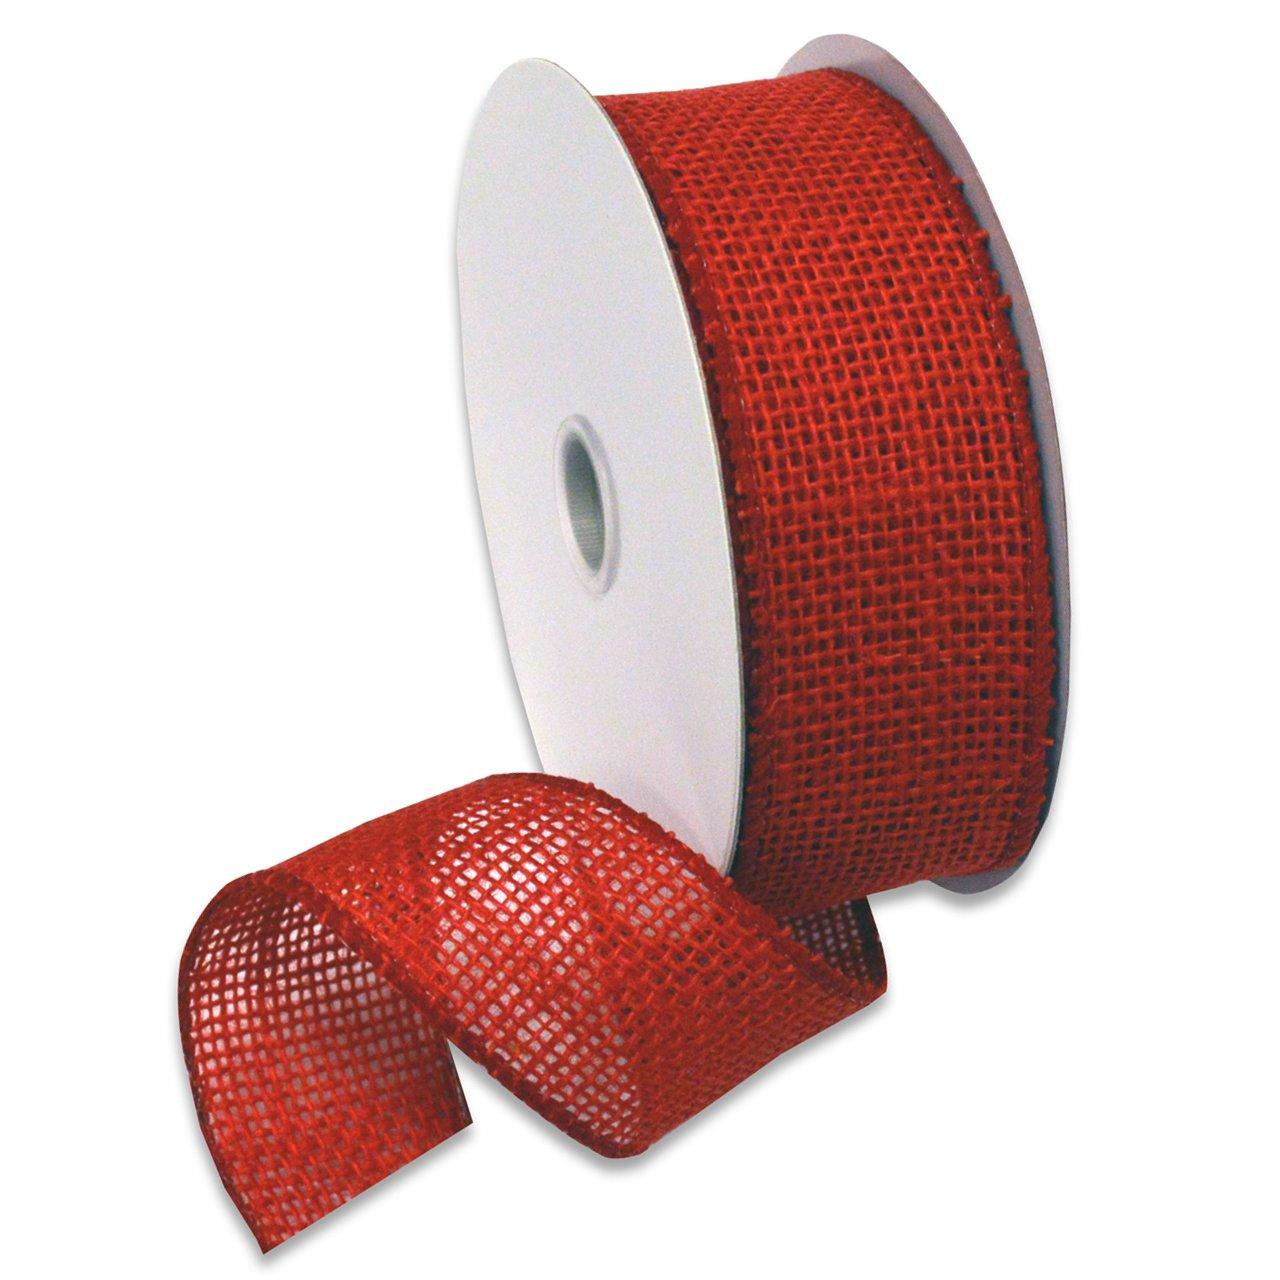 Morex Ribbon Burlap Wired Ribbon, 1-1/2-Inch by 10-Yard Spool, Natural 1252.40/10-004